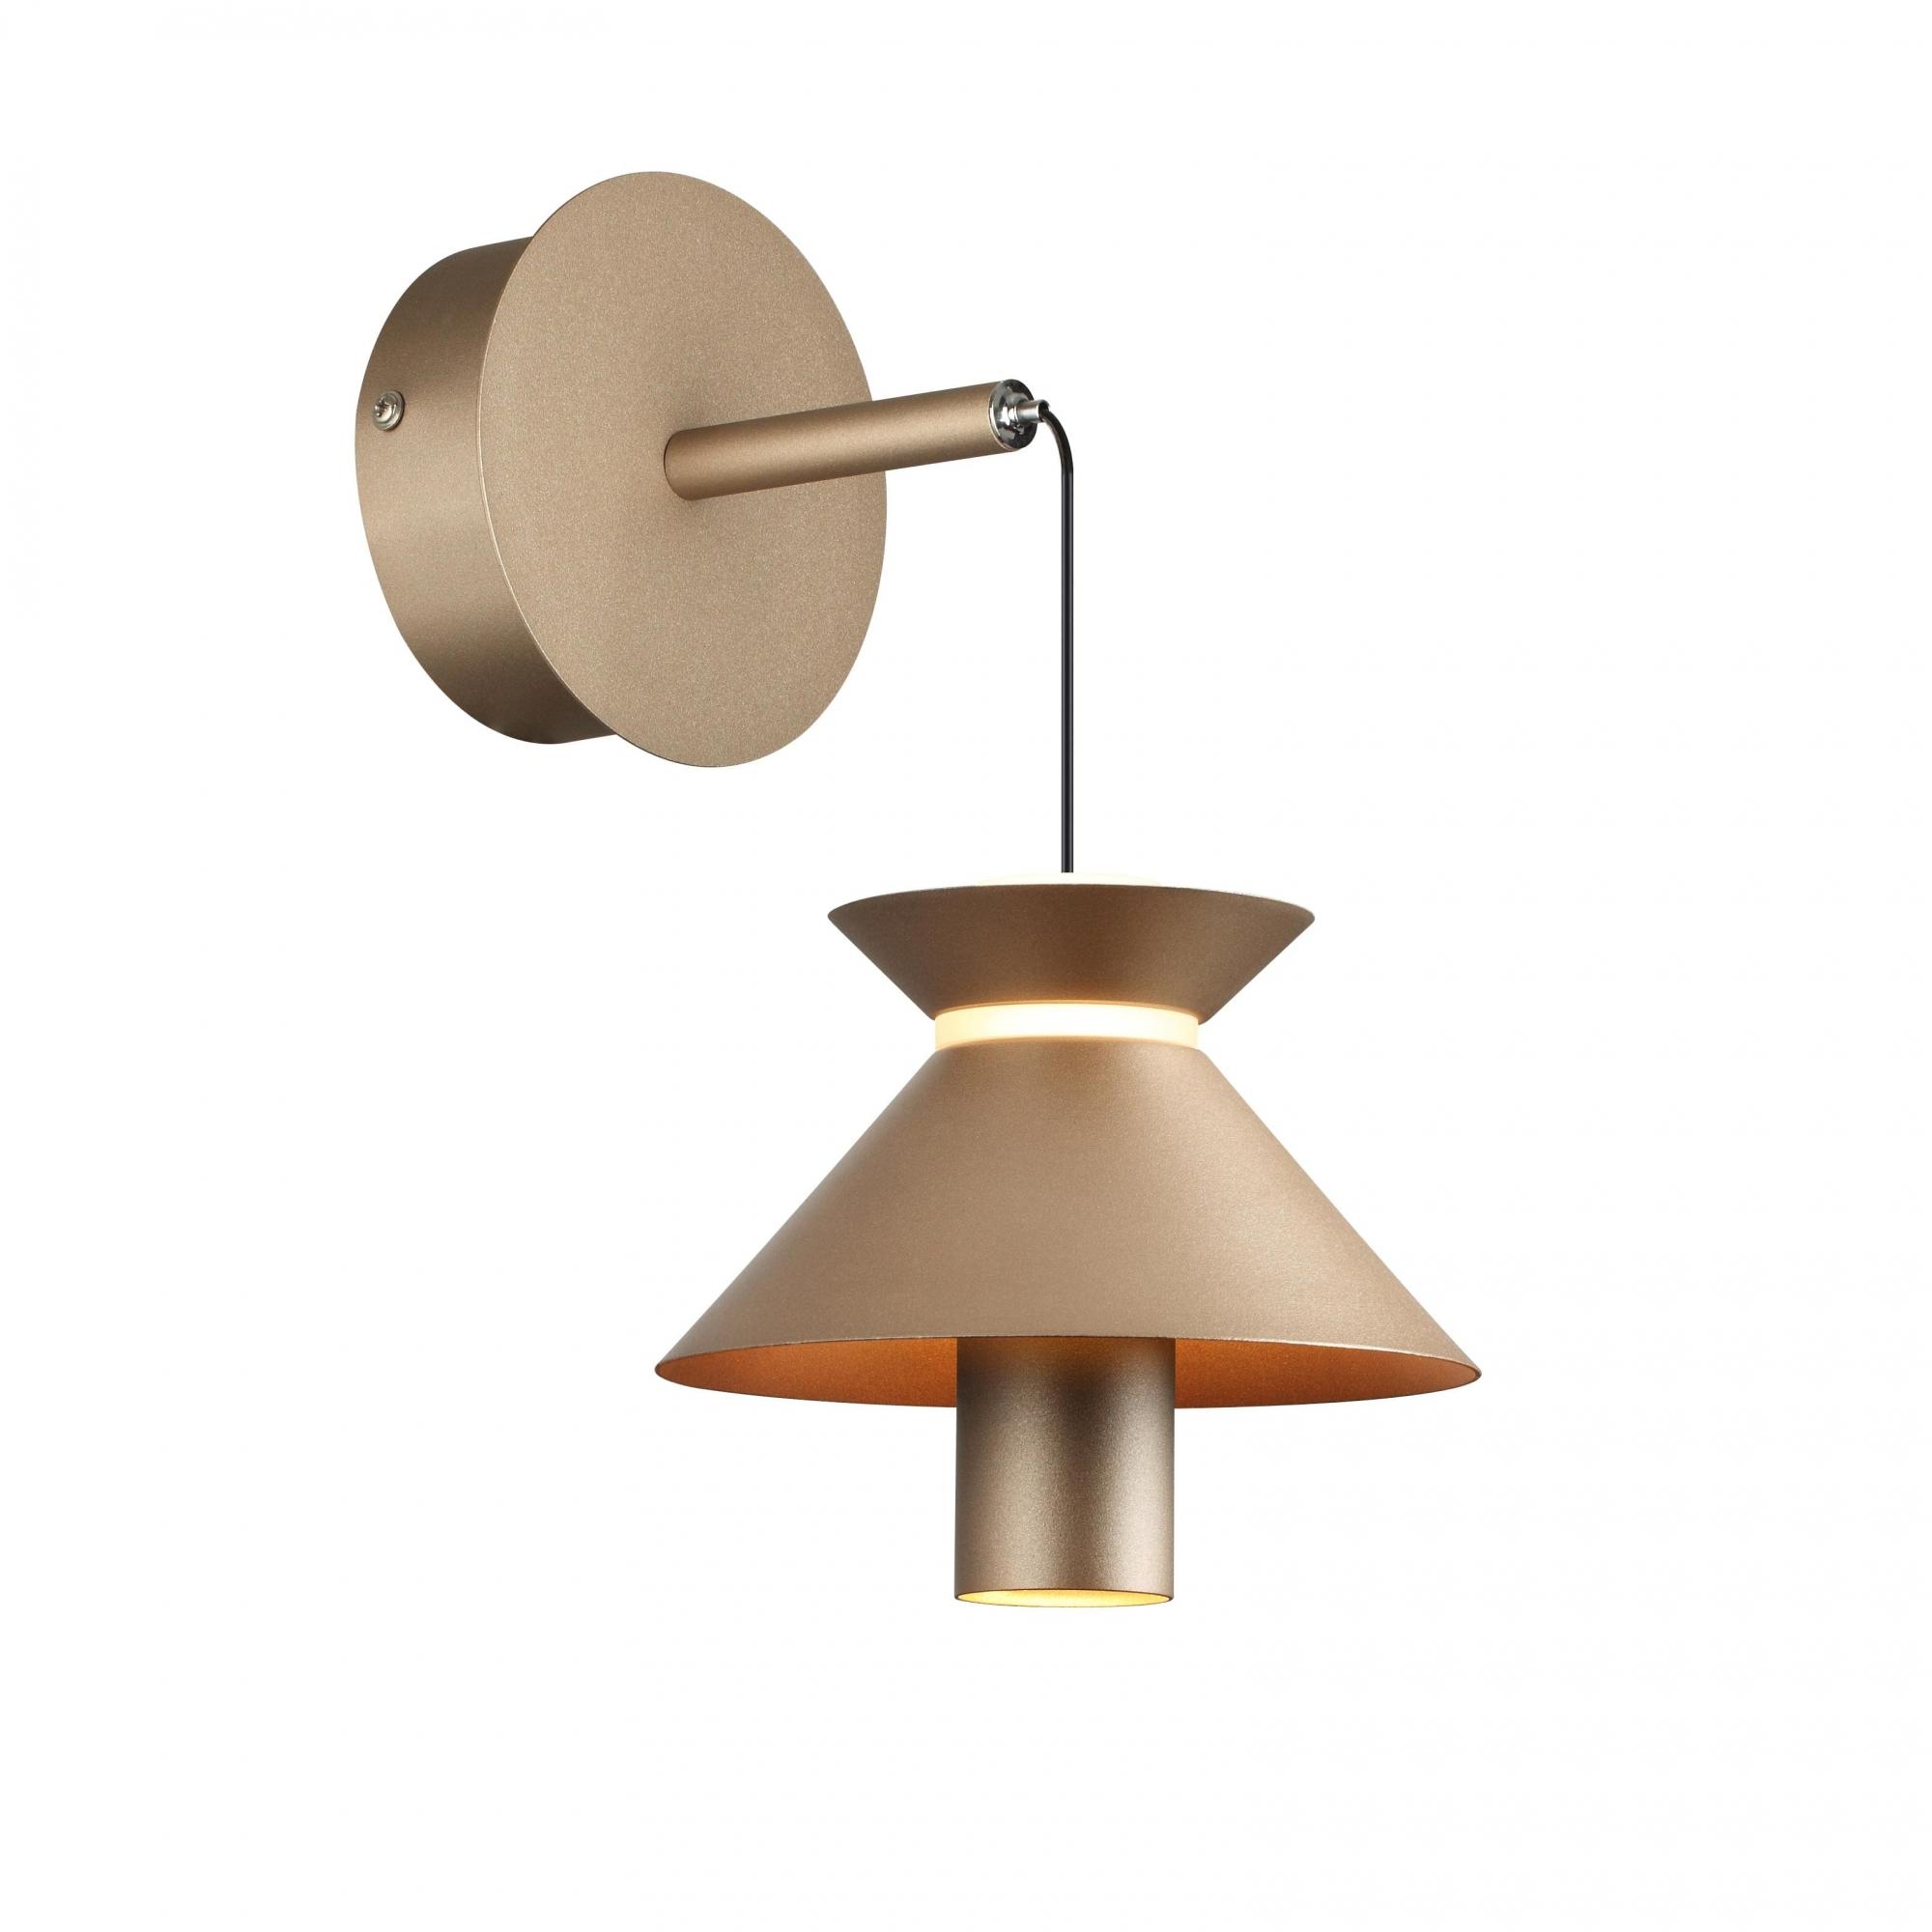 Arandela Cordel Pale Gold 22x15x13cm Led 6W Bilvolt Bella Iluminação CD009